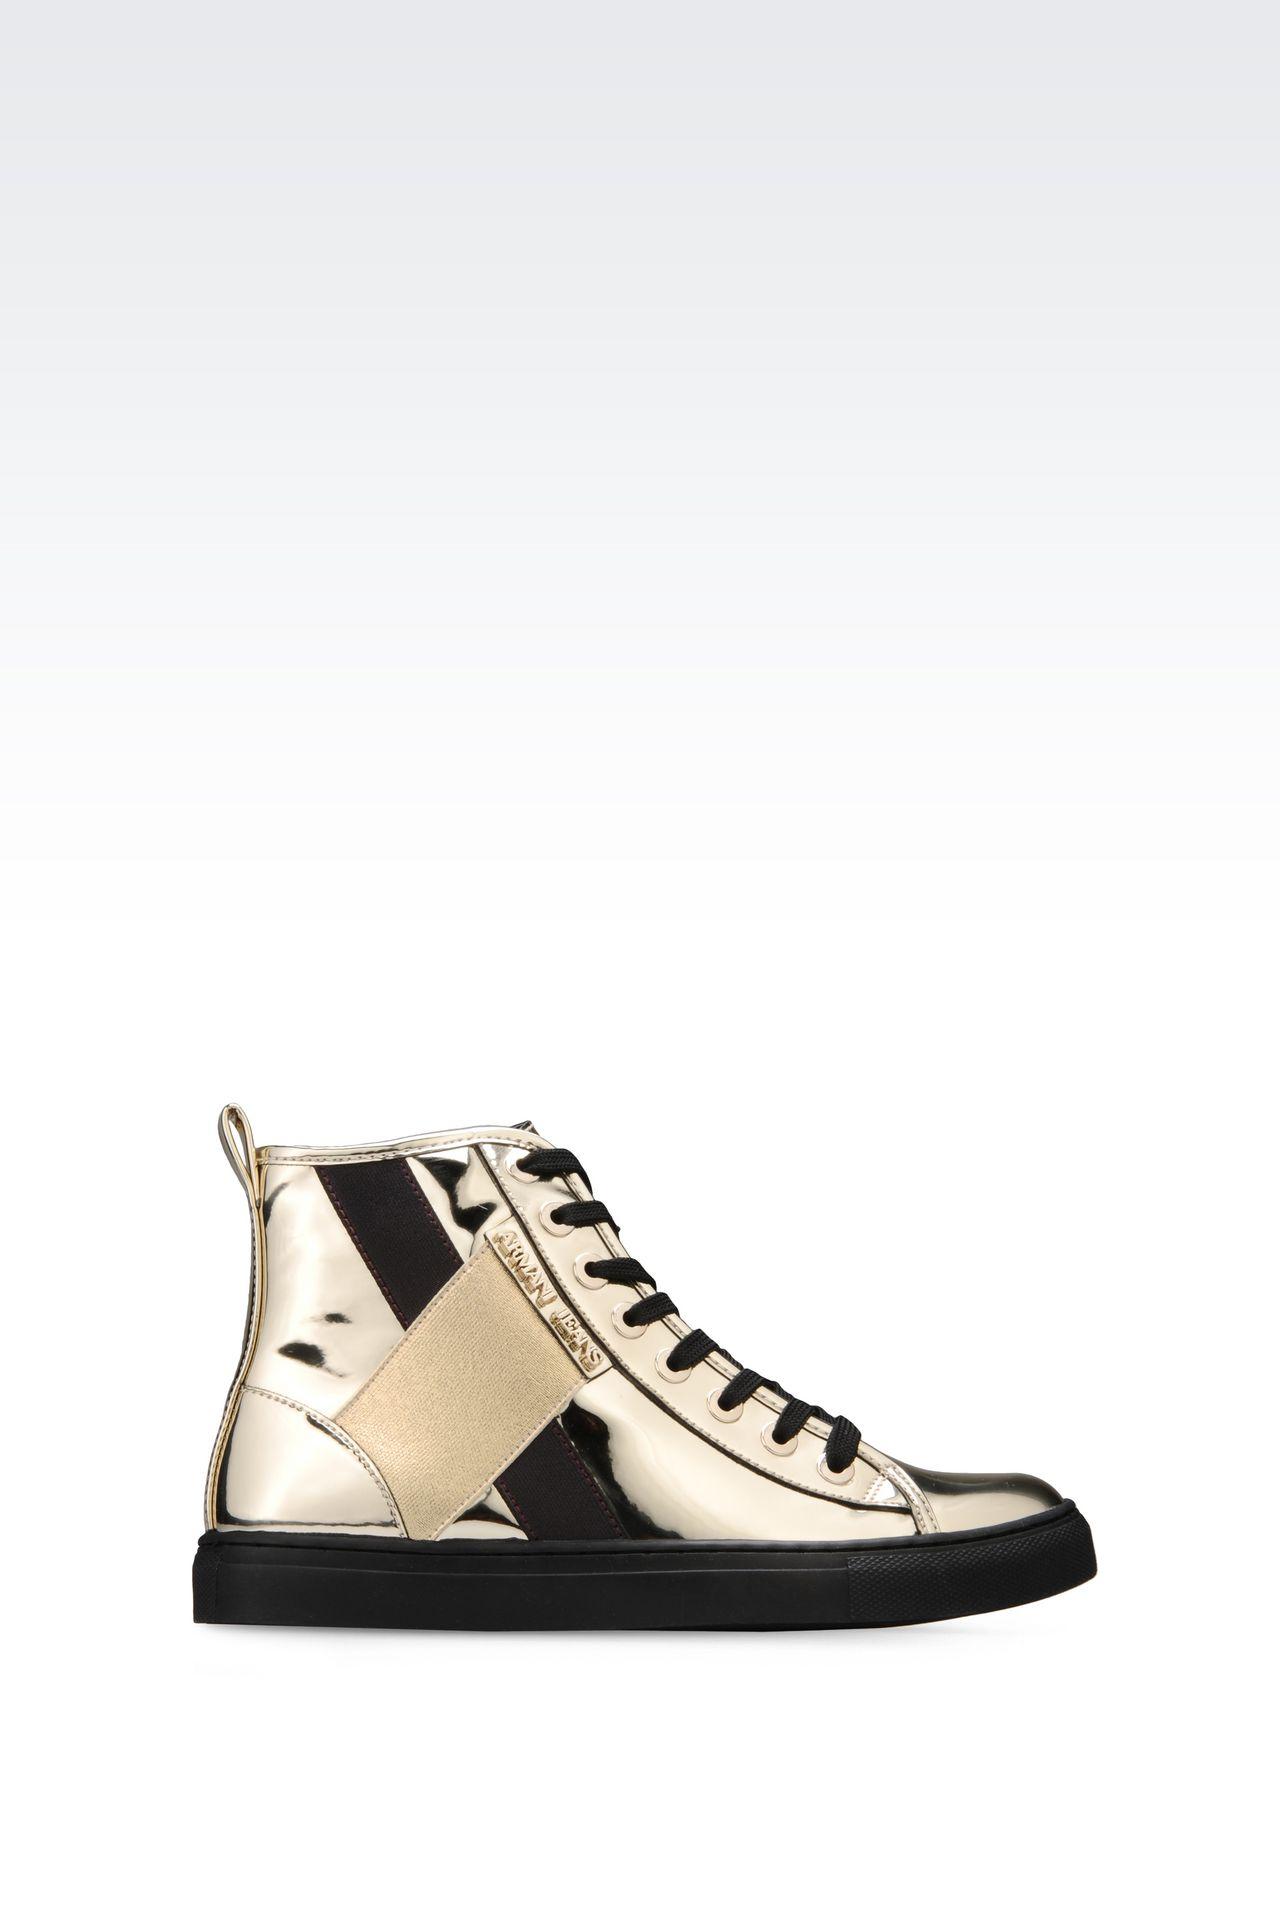 1ad749de2f9b armani jeans jacket  l6nexv Armani shoes Gold